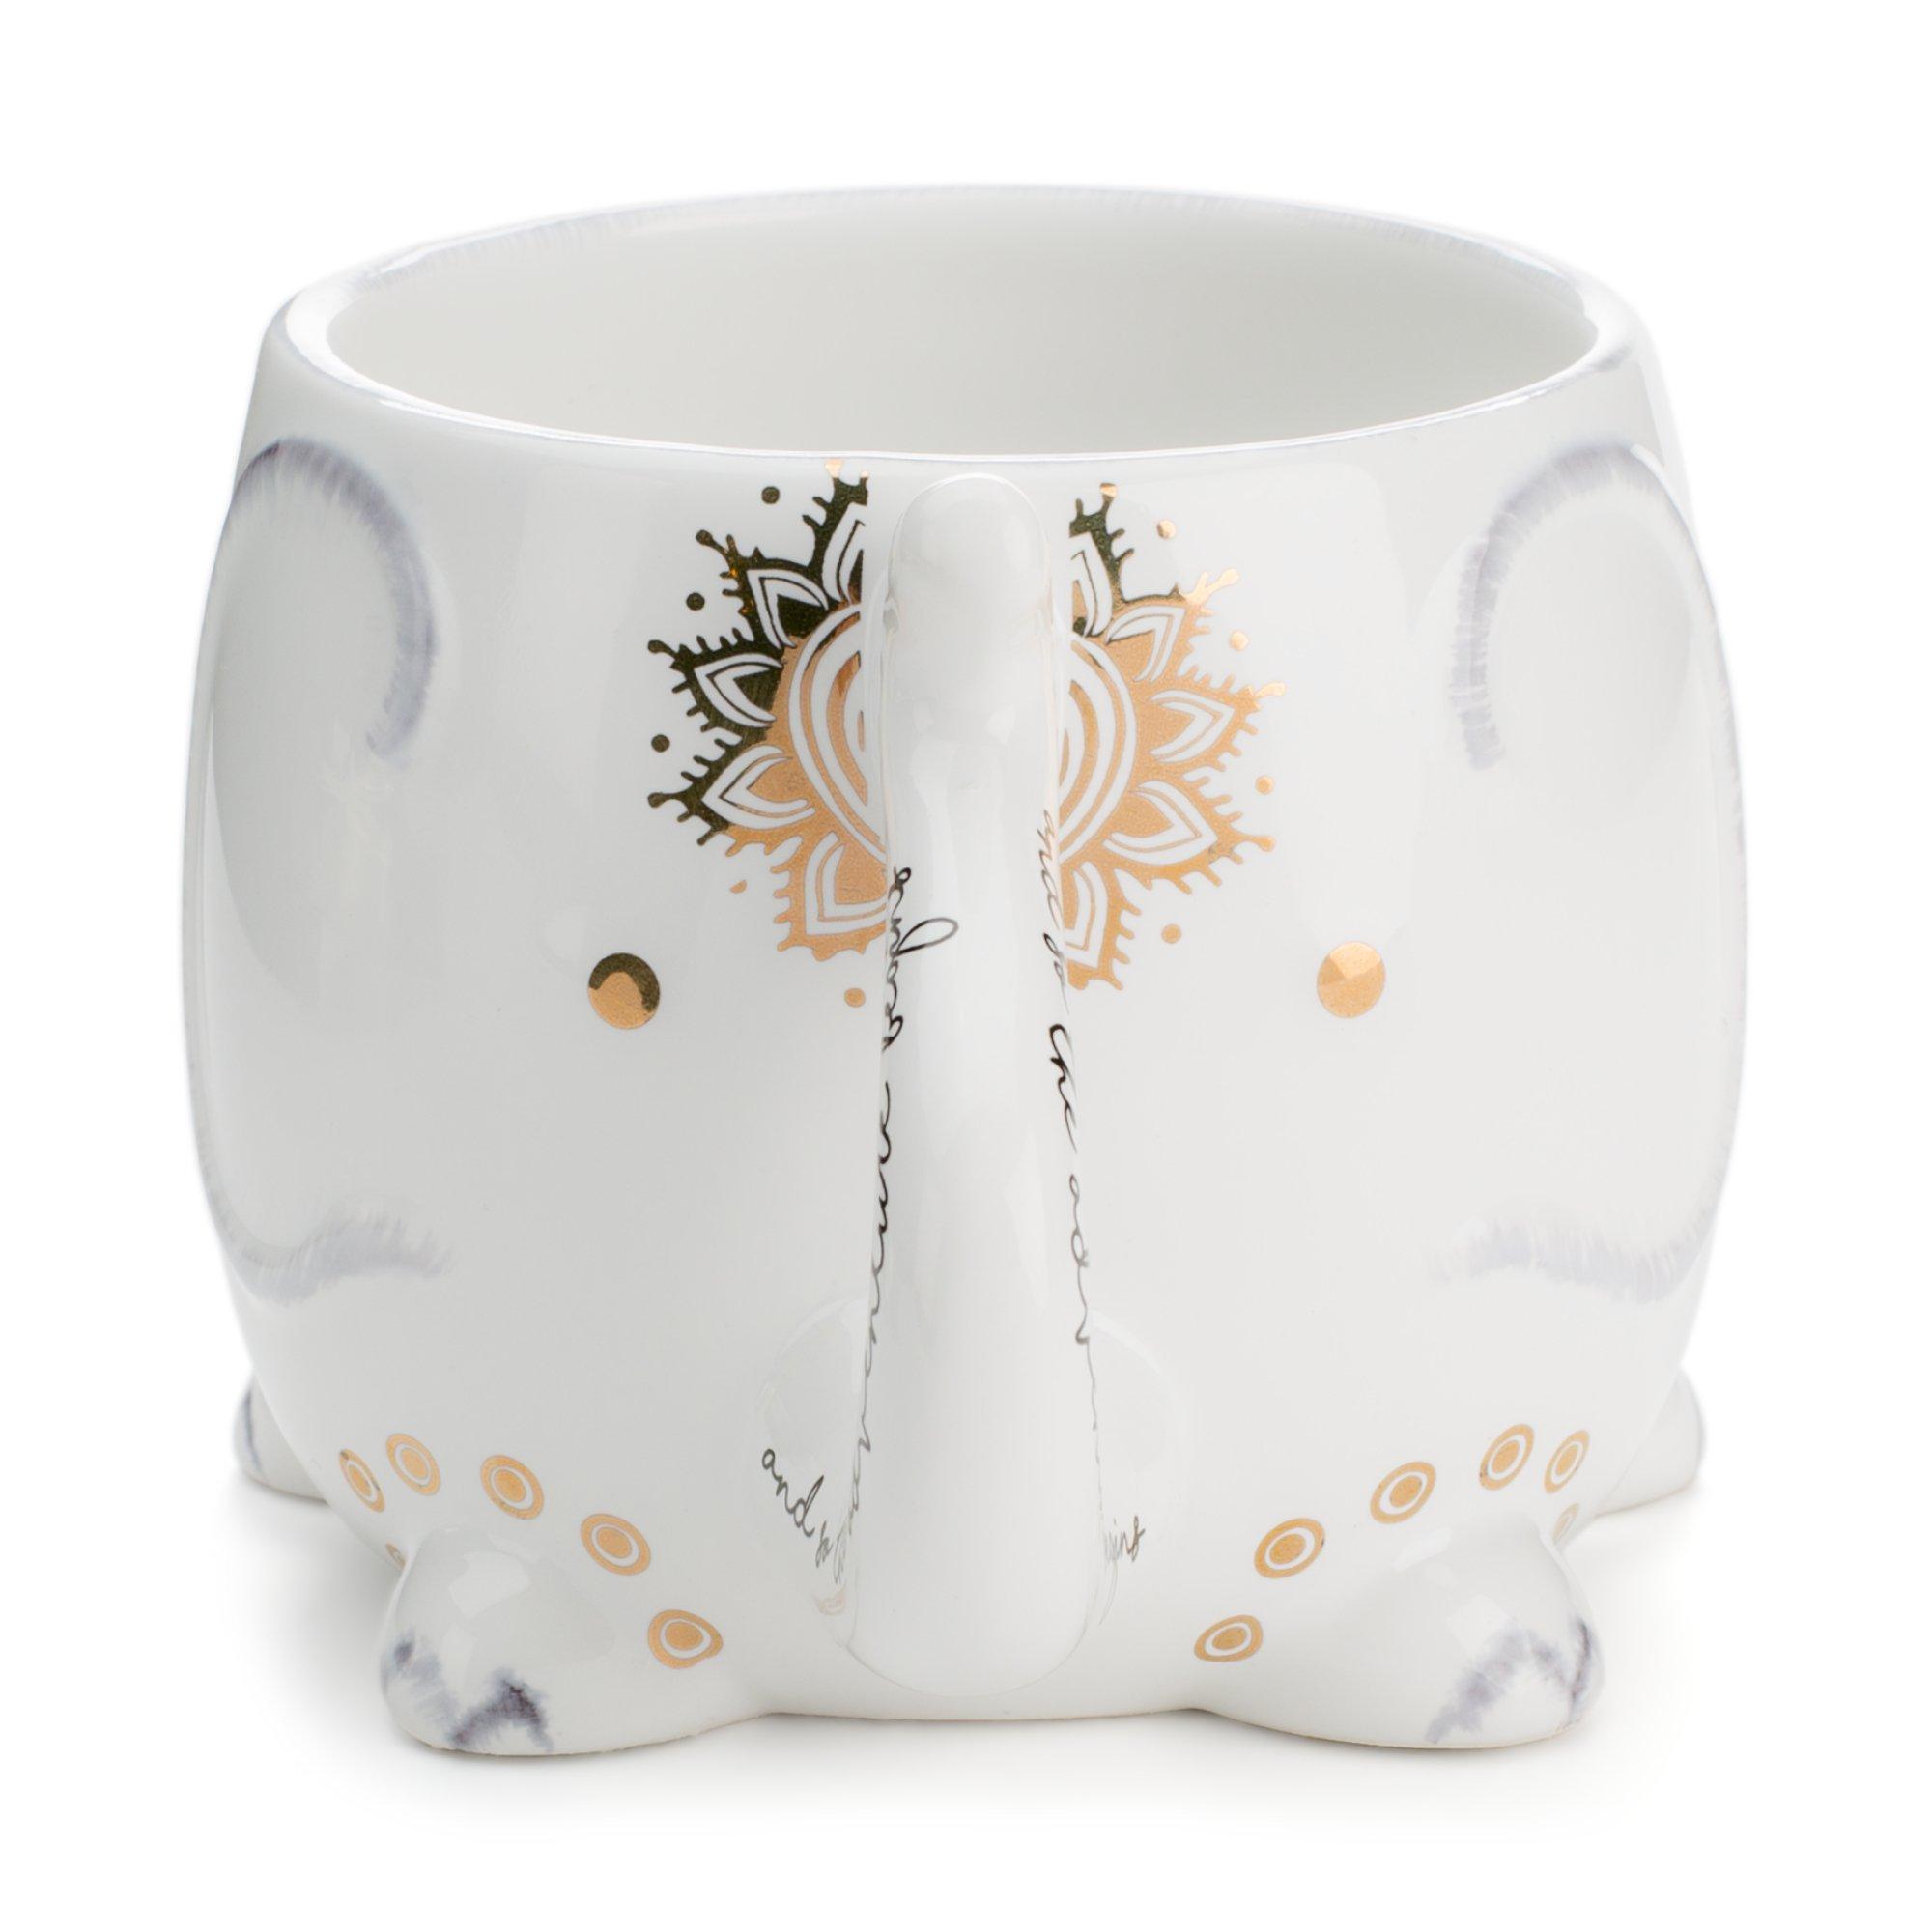 White Ceramic Coffee or Tea Mugs: Tri-Coastal Design Soho Boho Elephant Coffee Mug with Gold Foil Details, Fun Trunk Handle and Printed Saying - 18.6 Fluid Ounce Large, Cute Handmade Cup by Tri-coastal Design (Image #2)